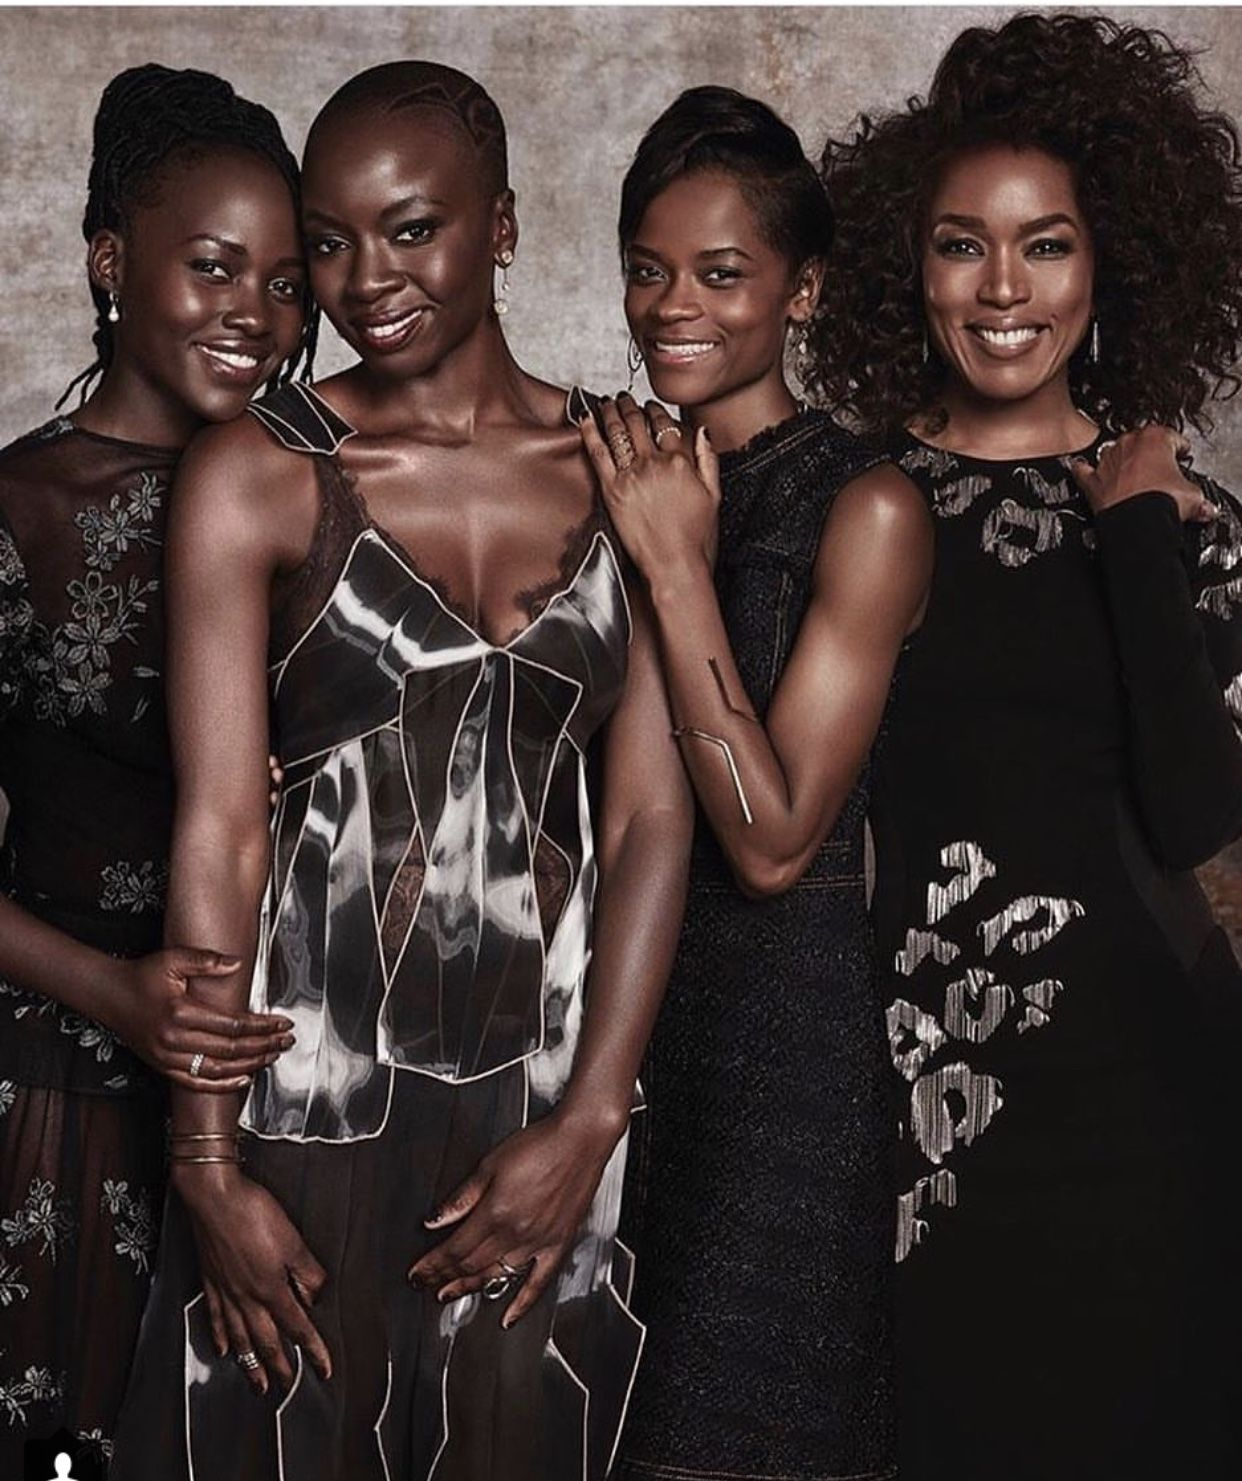 dead53b56 The fabulous ladies of 'Black Panther' - Lupita Nyong'o, Danai Gurira,  Letitia Wright and Angela Bassett